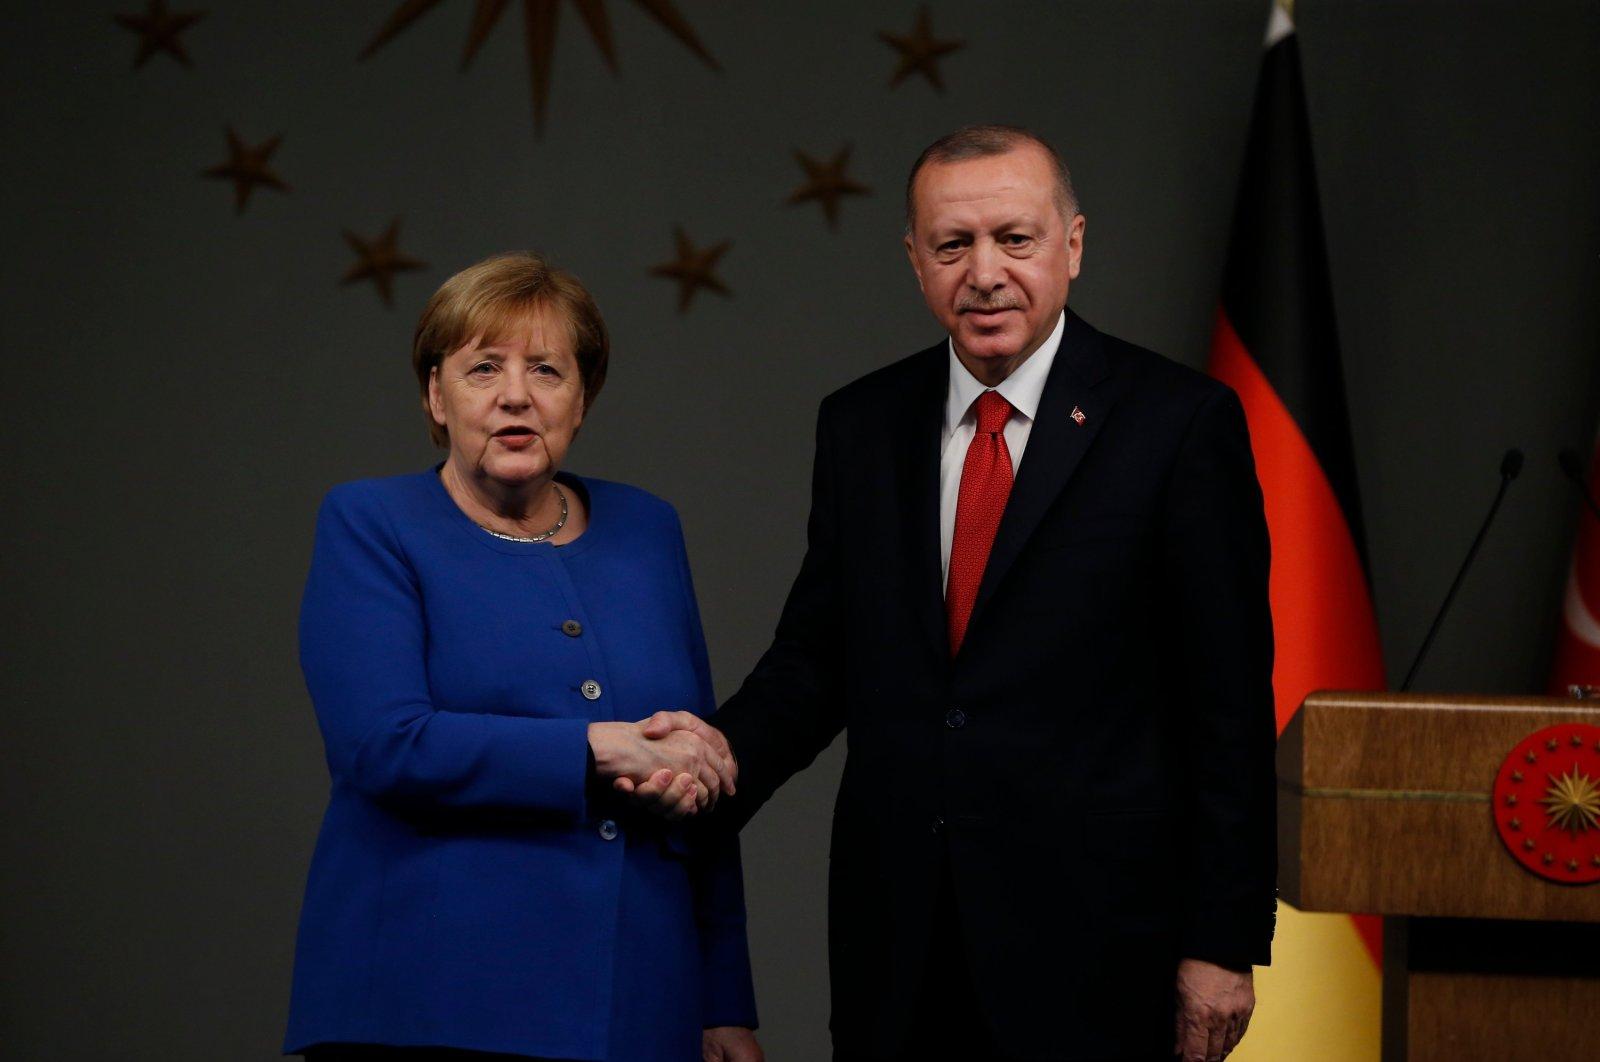 Germany's Chancellor Angela Merkel shakes hands with Turkey's President Recep Tayyip Erdoğan following a joint news conference, Istanbul, Turkey, Jan. 24, 2020. (AP Photo)